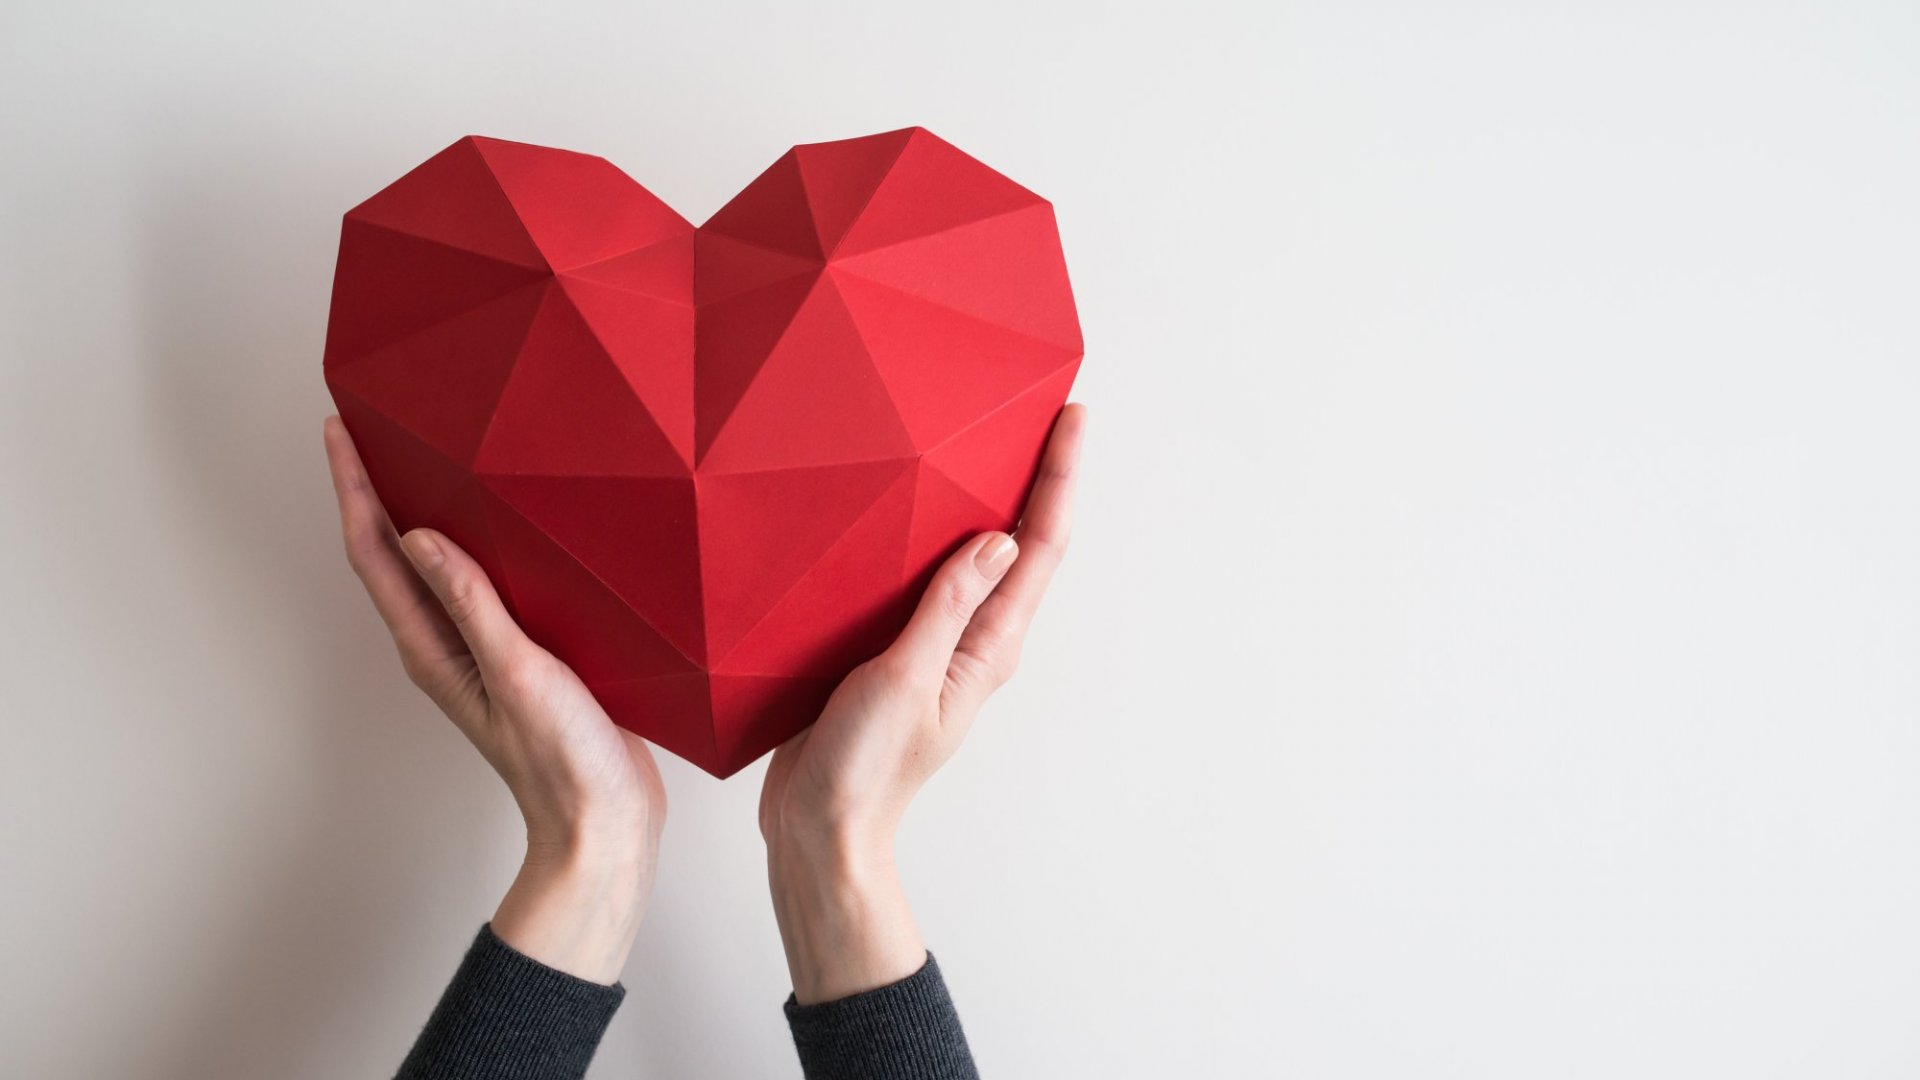 3 Ways to Reinforce Self-Love